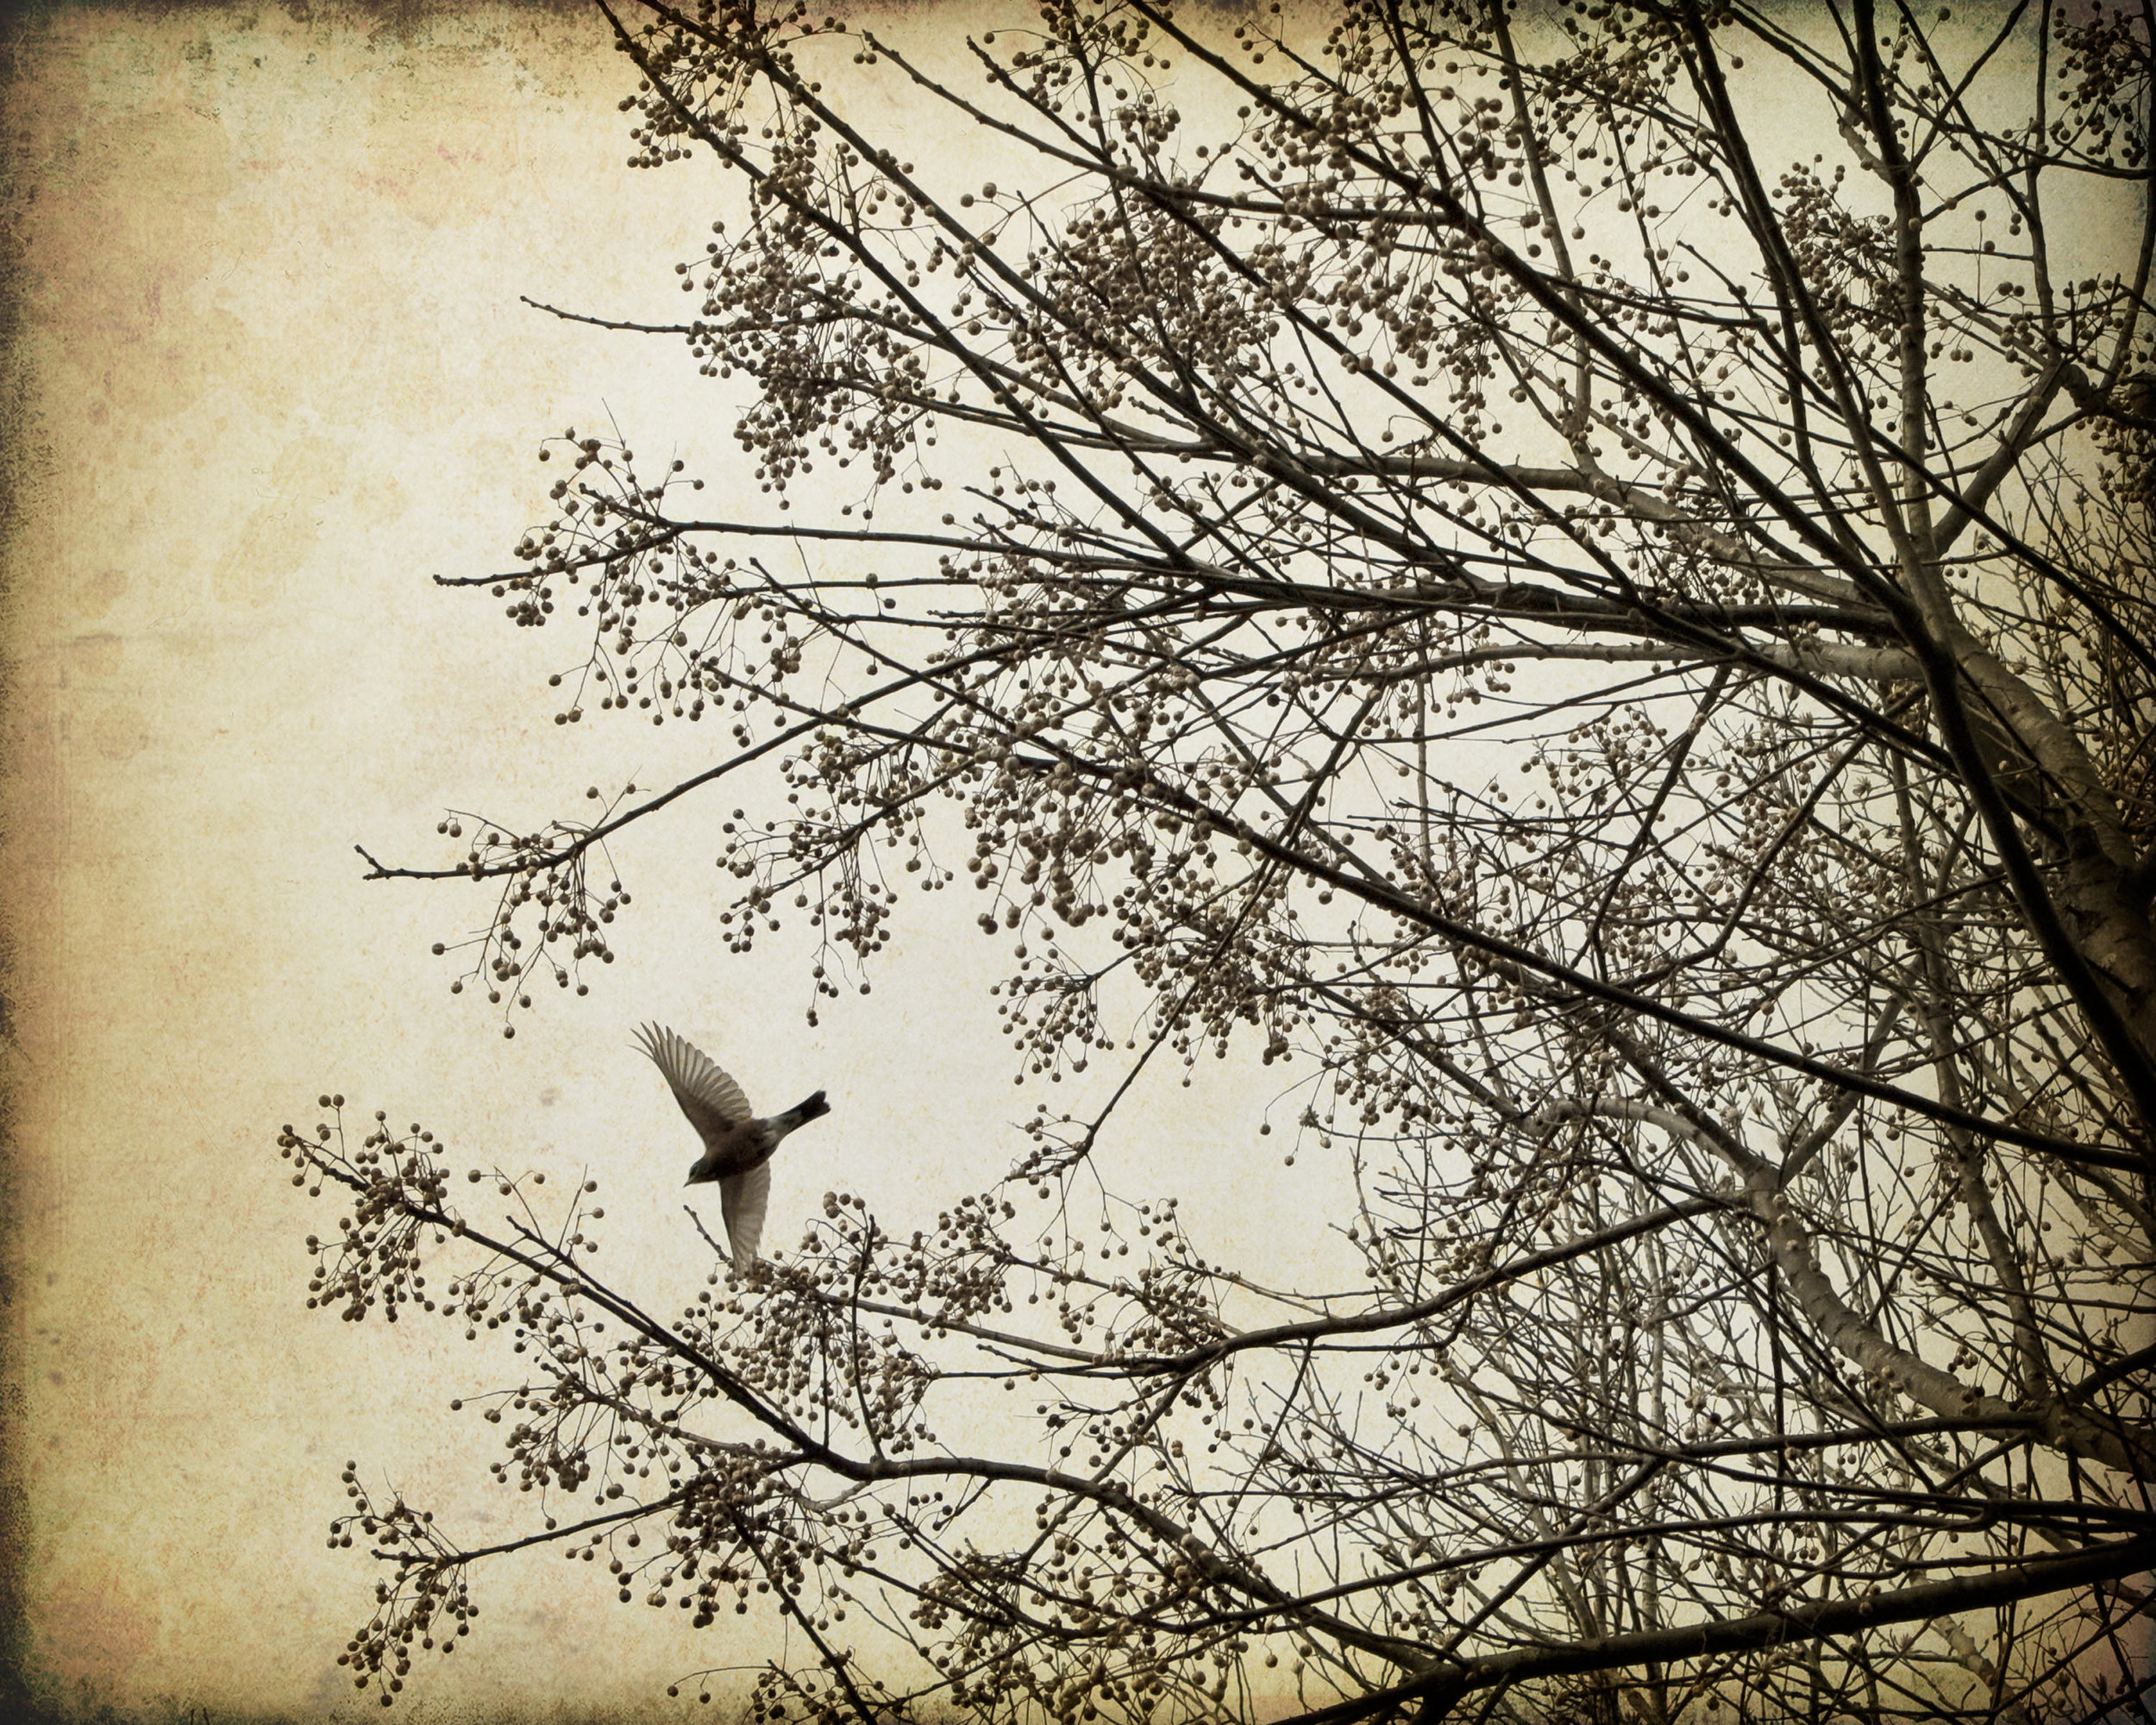 ease-birds-4x5r-3454.jpg